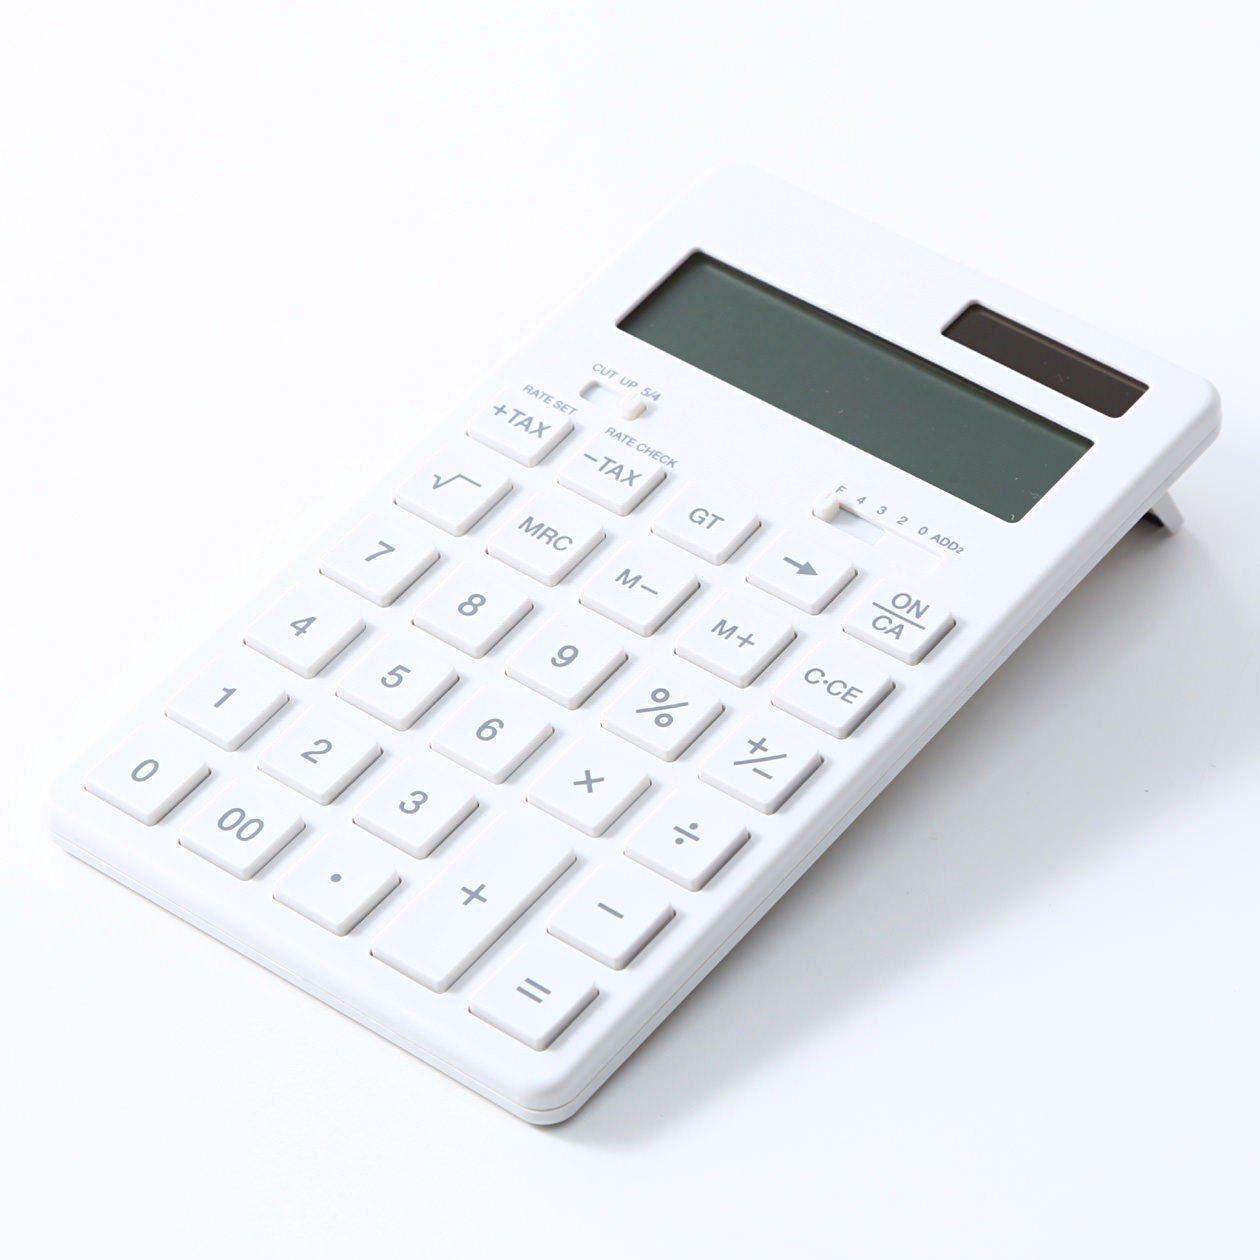 MUJI無印良品計算機系列,新售價降幅約6%左右。圖/無印良品提供